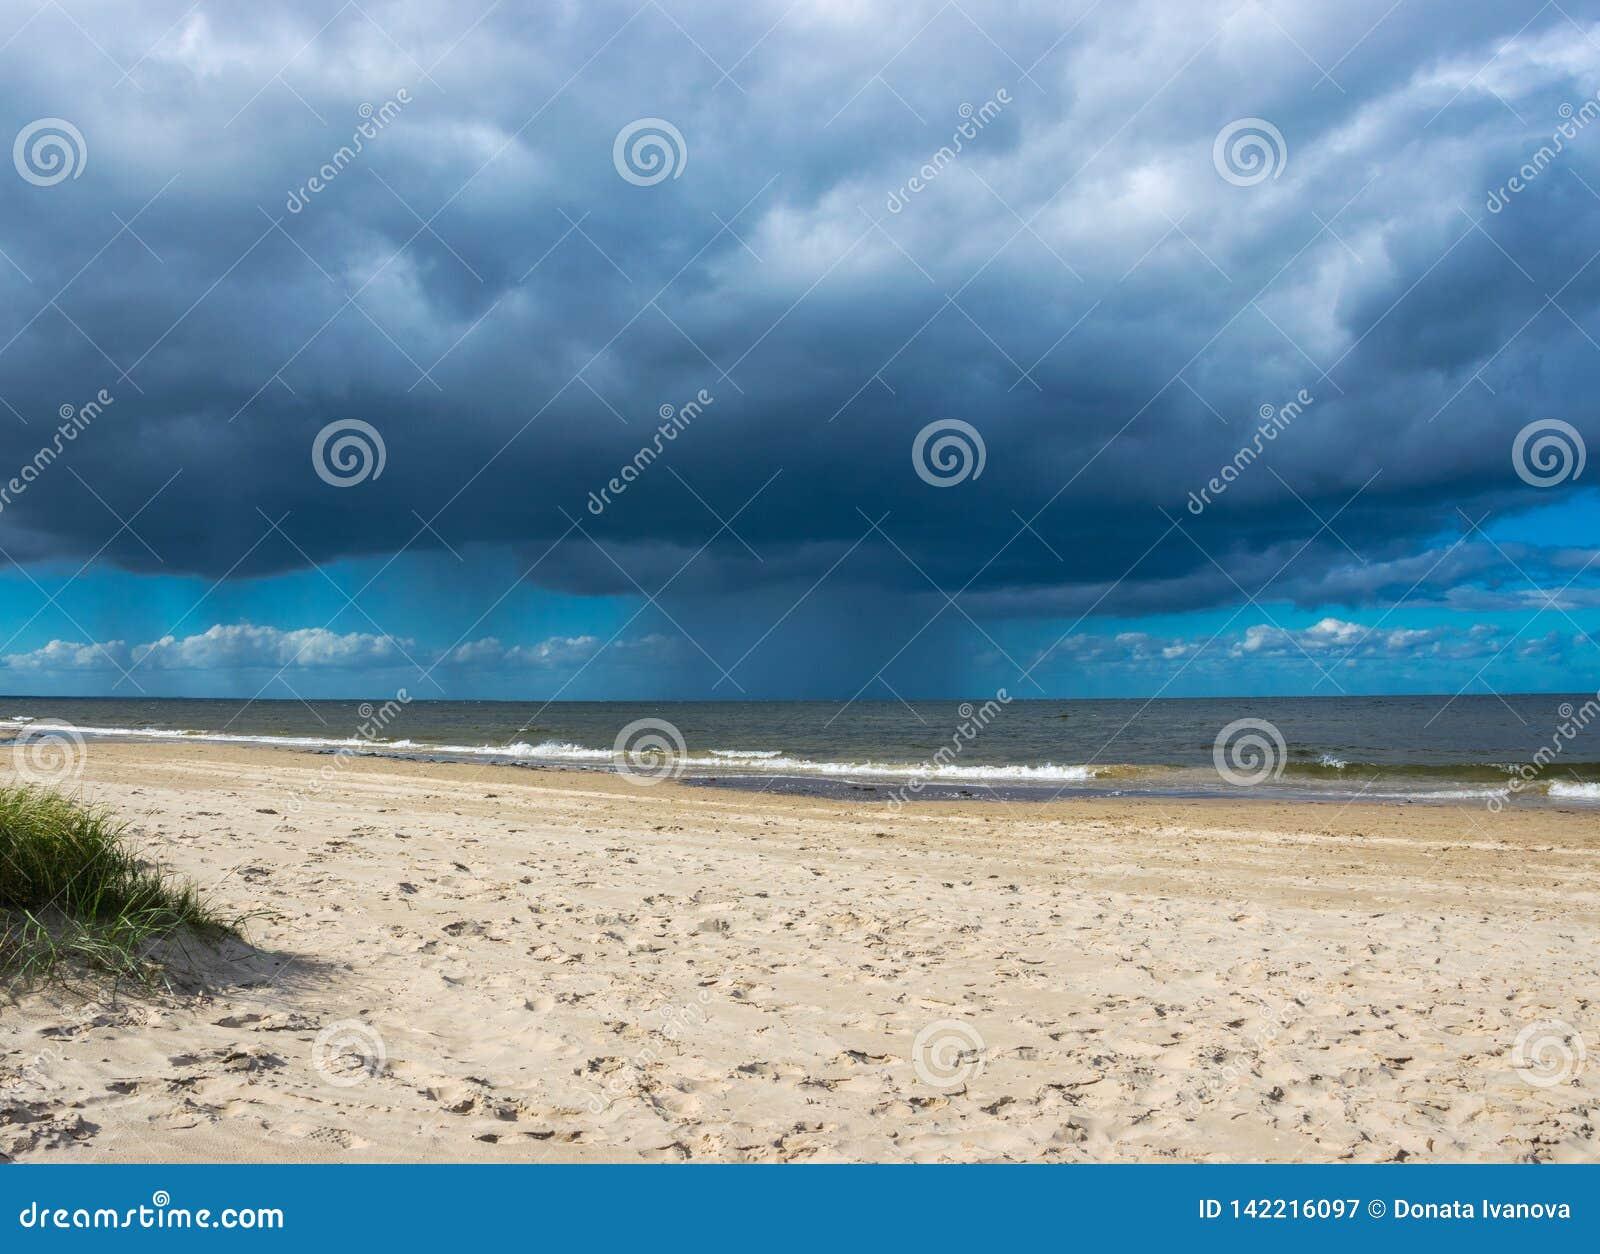 Dark rain clouds above the Baltic sea. Raining